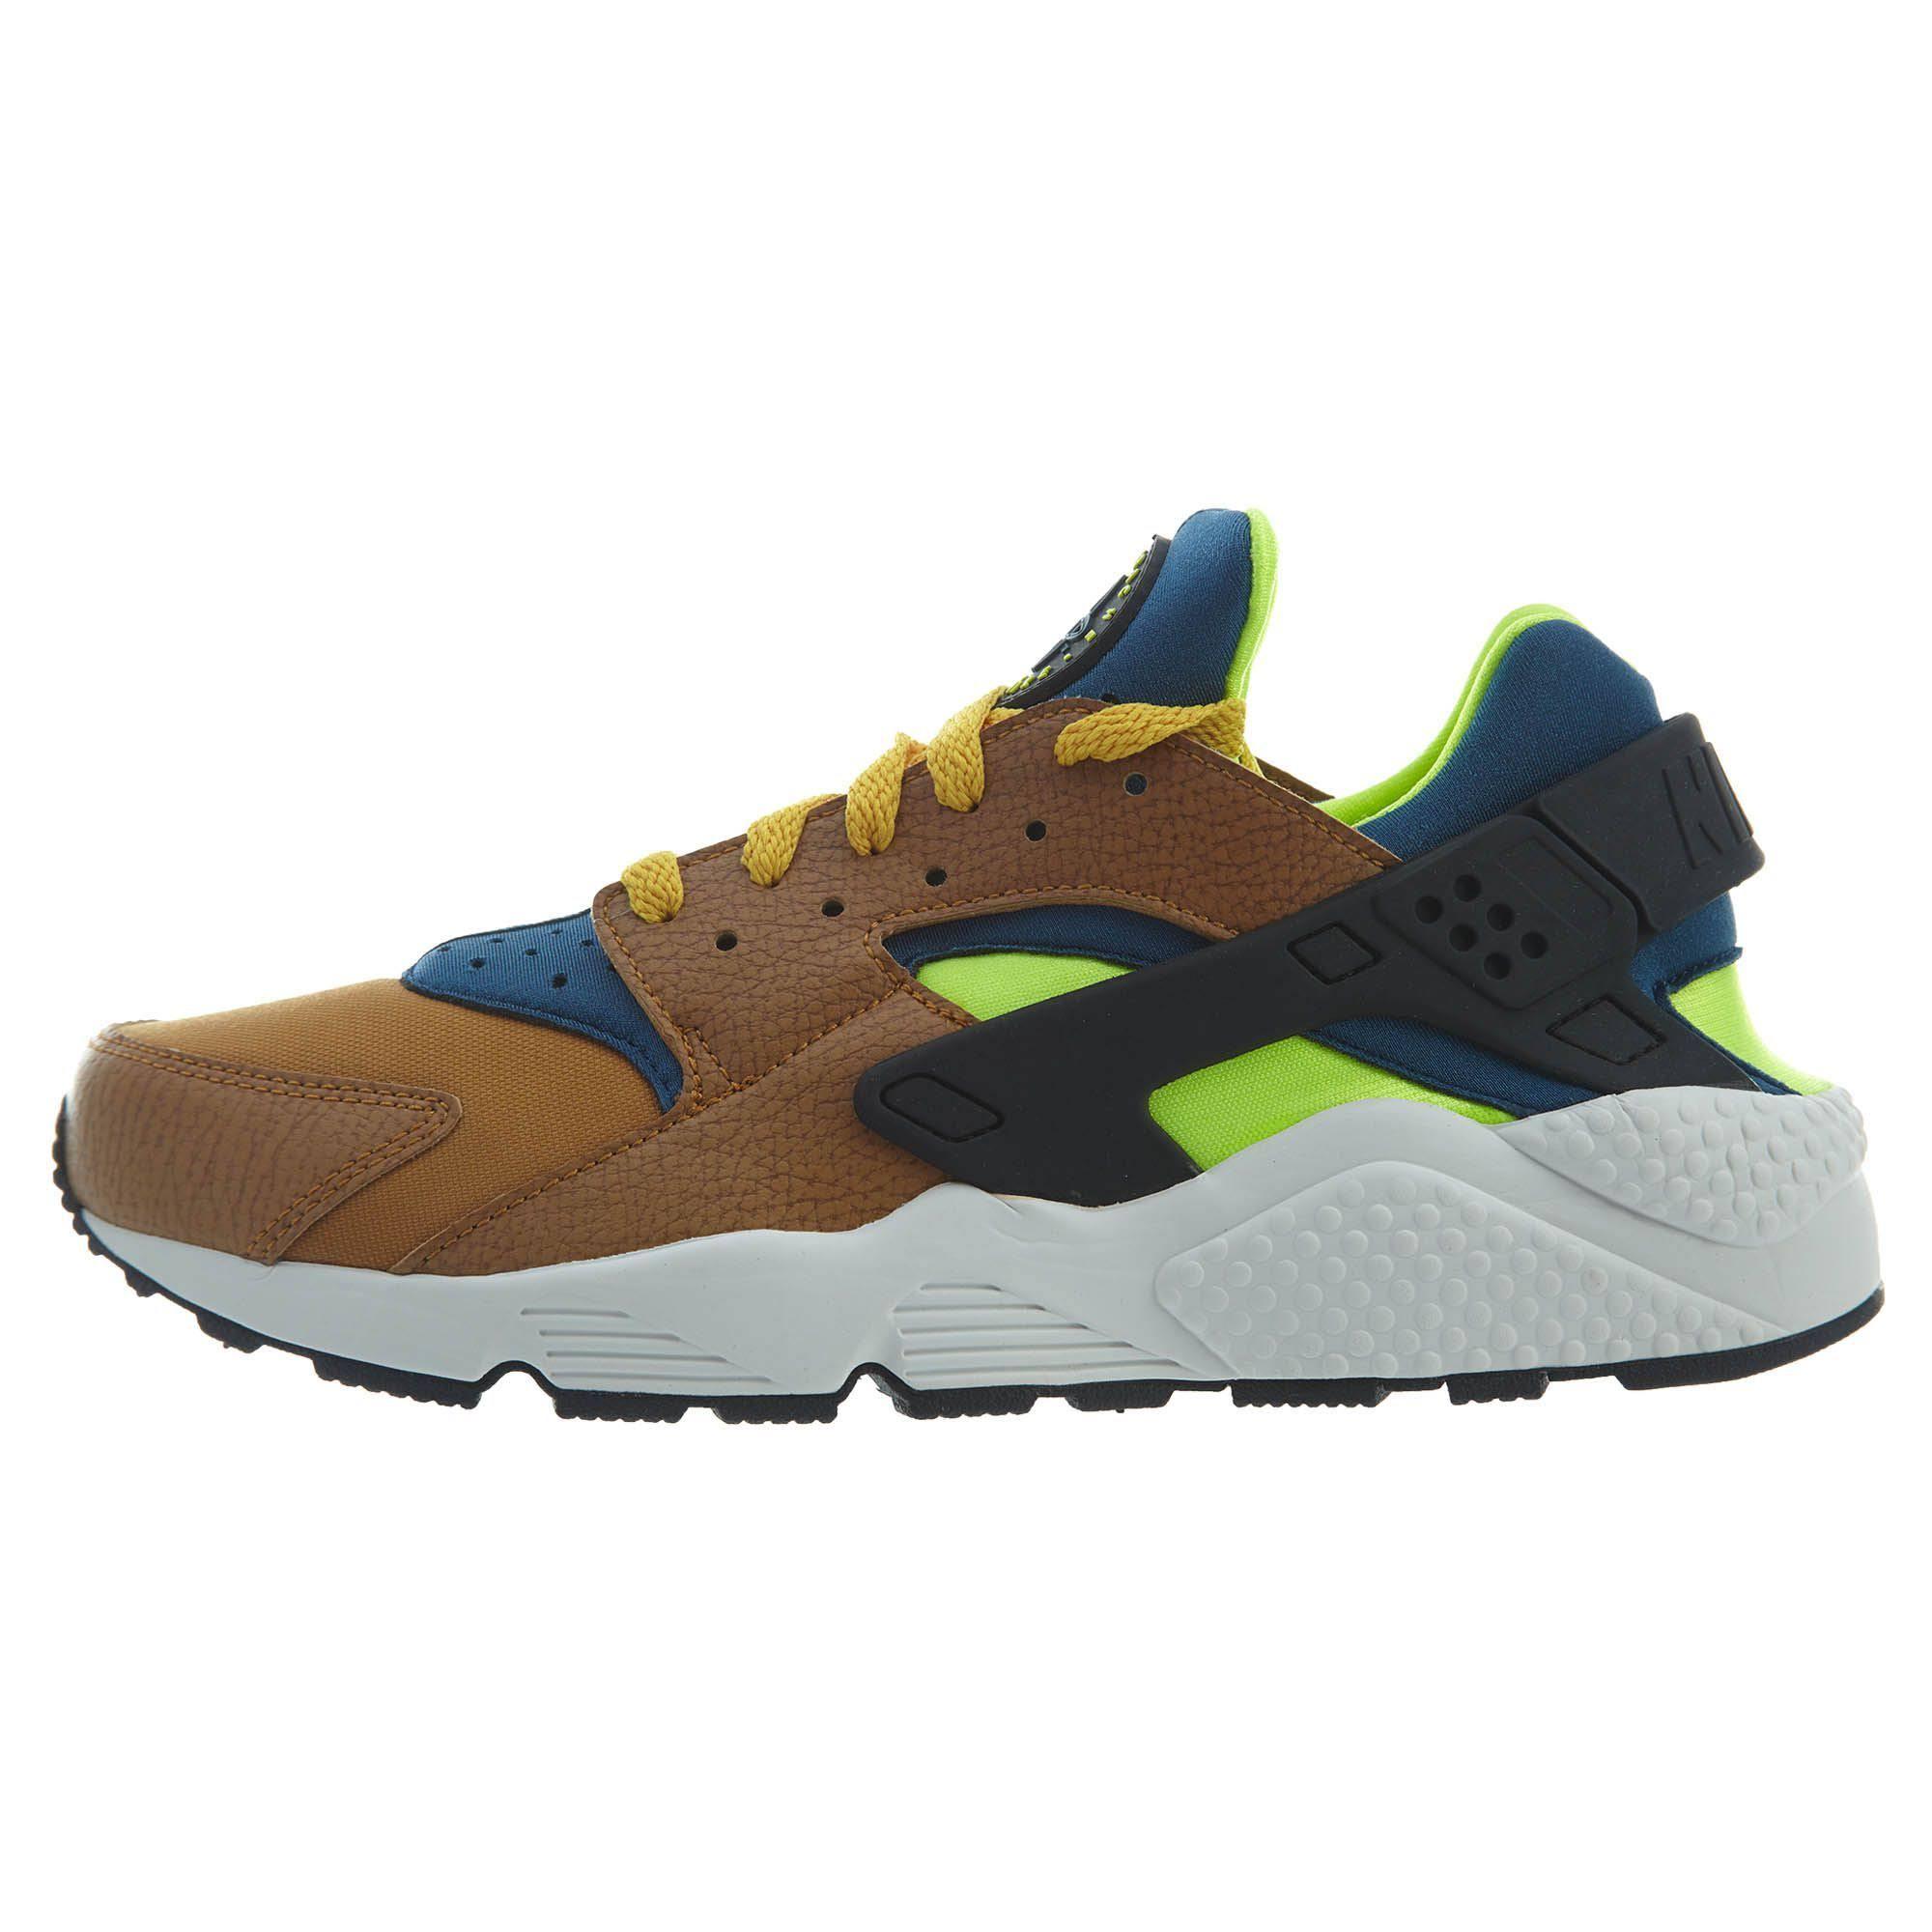 Hombre 701 Estilo Para 318429 Marrón Verde Negro Air Nike Huarache wcqUIfFI